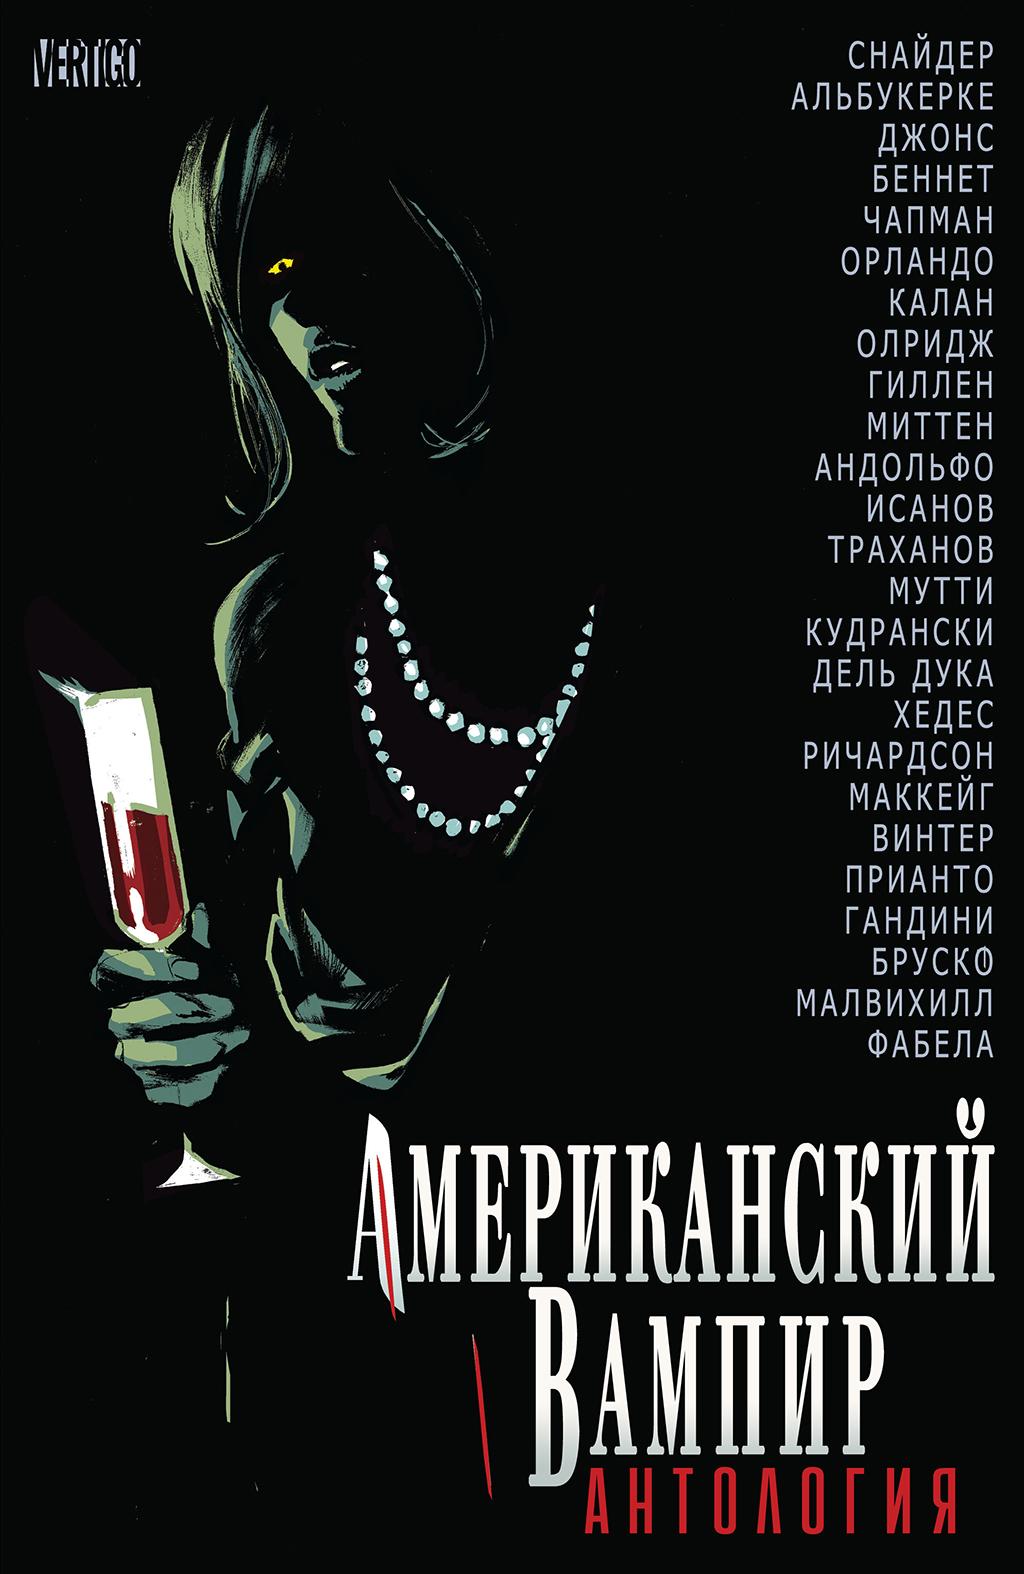 Комикс Американский Вампир Антология